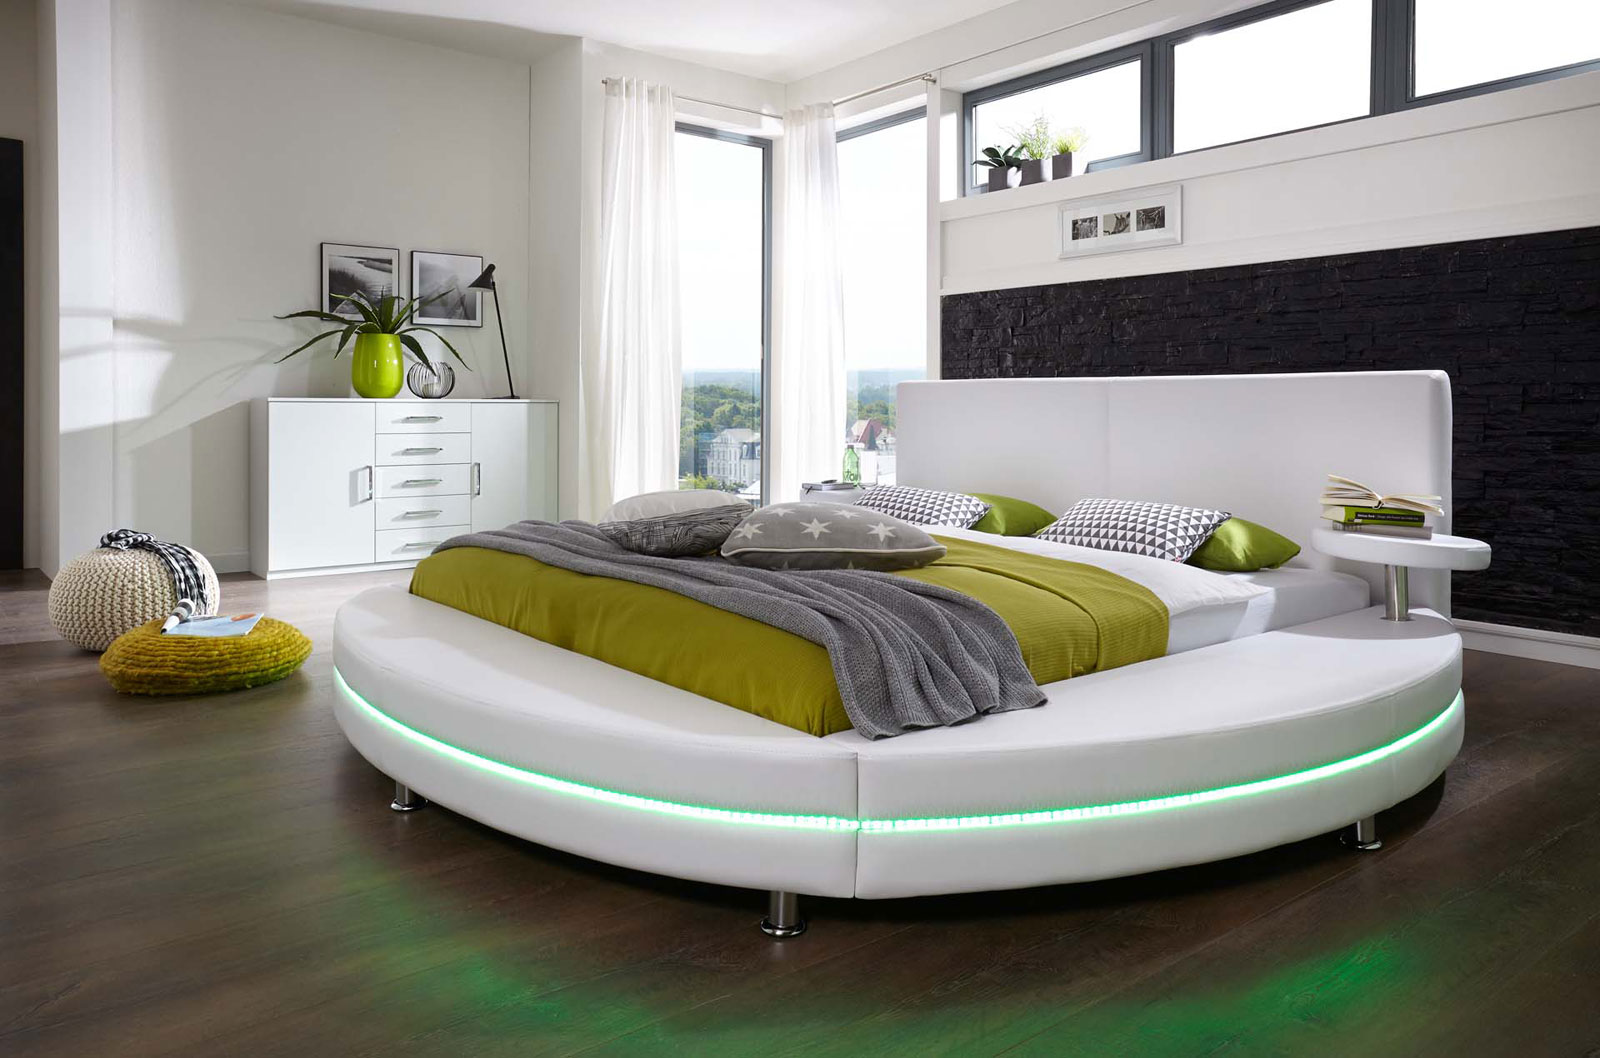 sam rundbett mit led 180 x 200 cm abgesteppt wei gallo bestellware. Black Bedroom Furniture Sets. Home Design Ideas